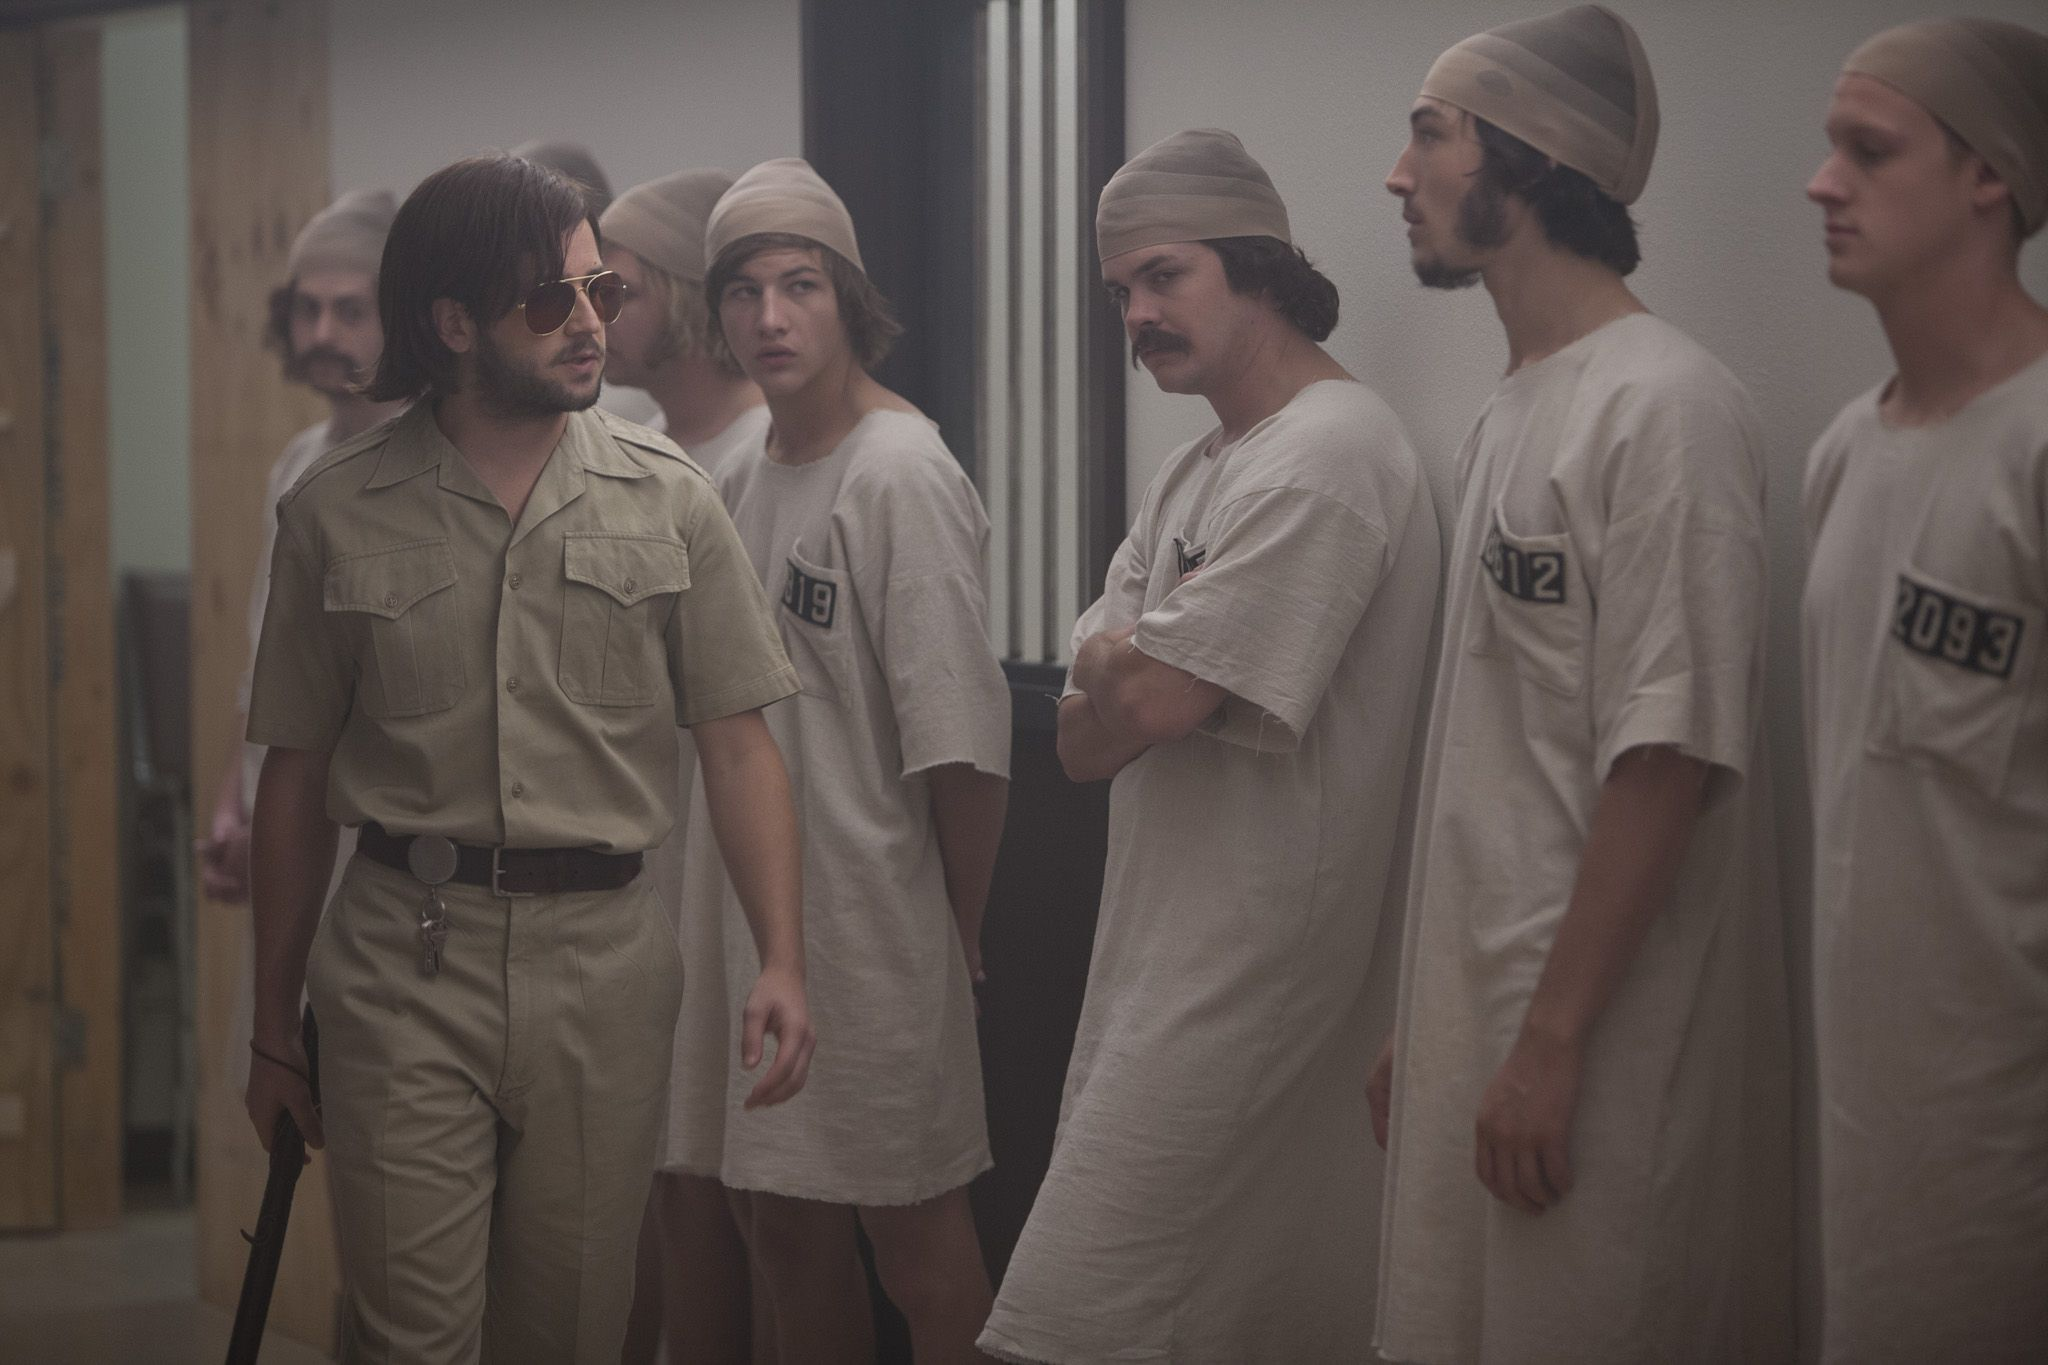 THE STANFORD PRISON EXPERIMENT Michael Angarano & Tye Sheridan & Johnny Simmons & Ezra Miller & Chris Sheffield Photo by Jas Shelton (1)